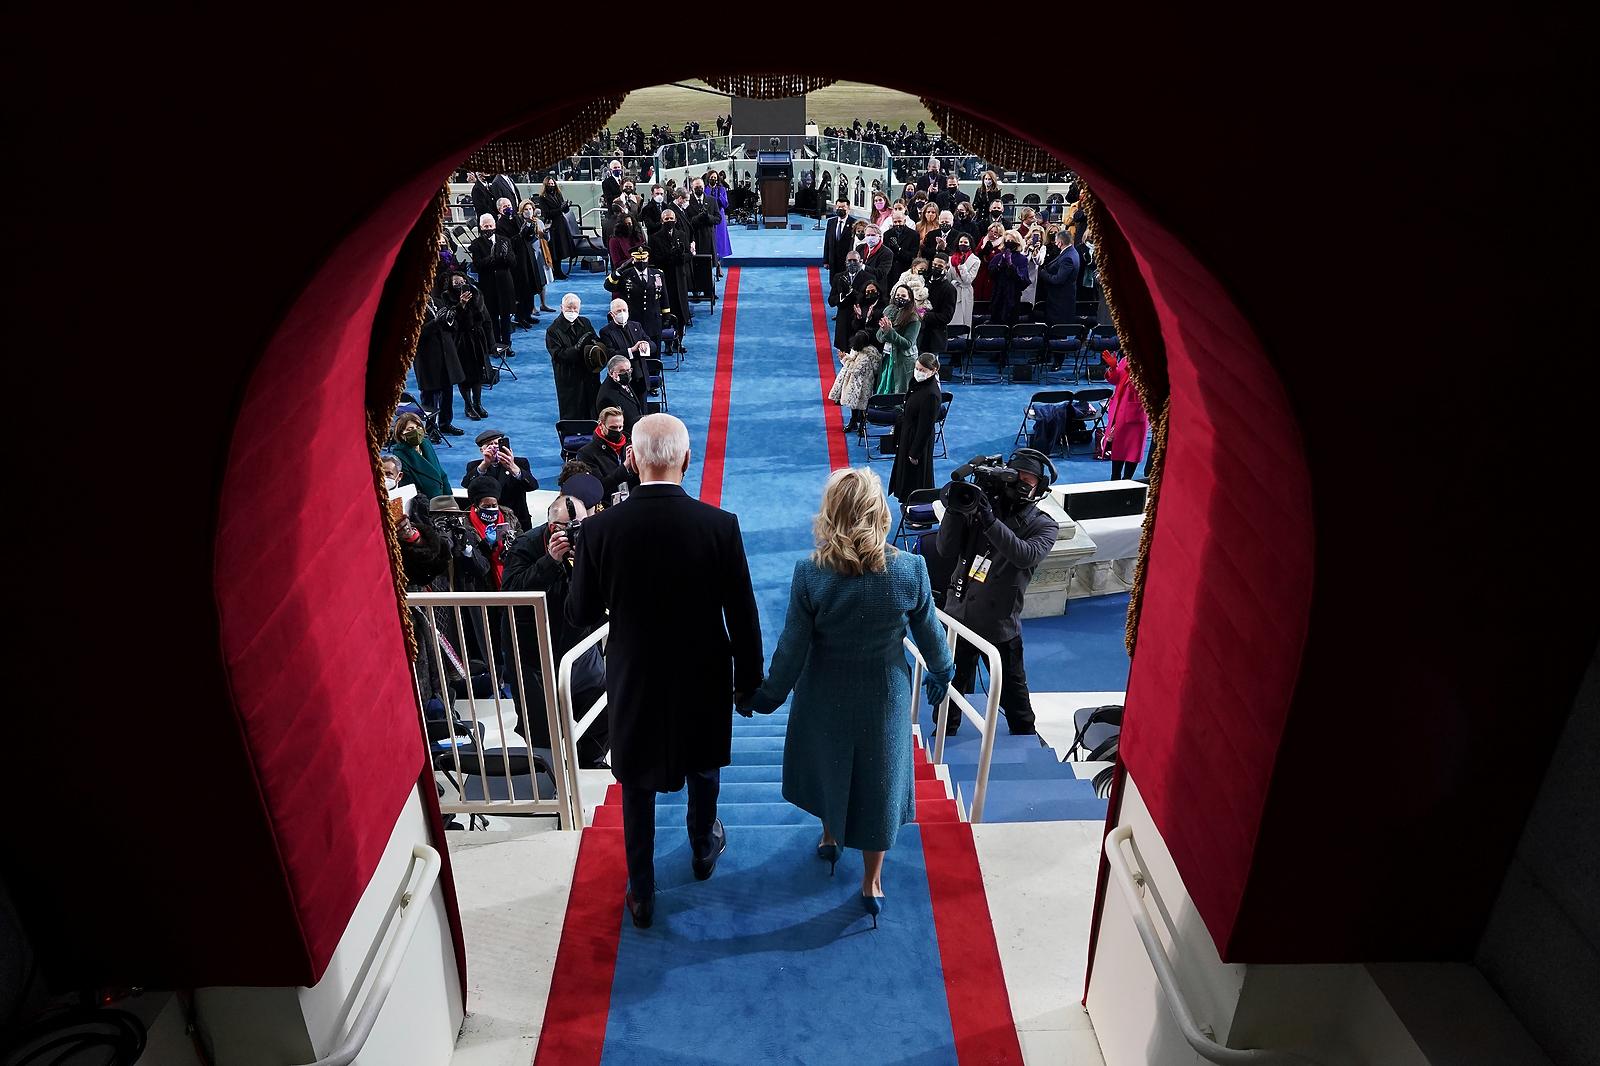 President-elect Joe Biden's and Dr. Jill Biden arrive his inauguration at the U.S. Capitol in Washington, Wednesday, Jan. 20, 2021. AP